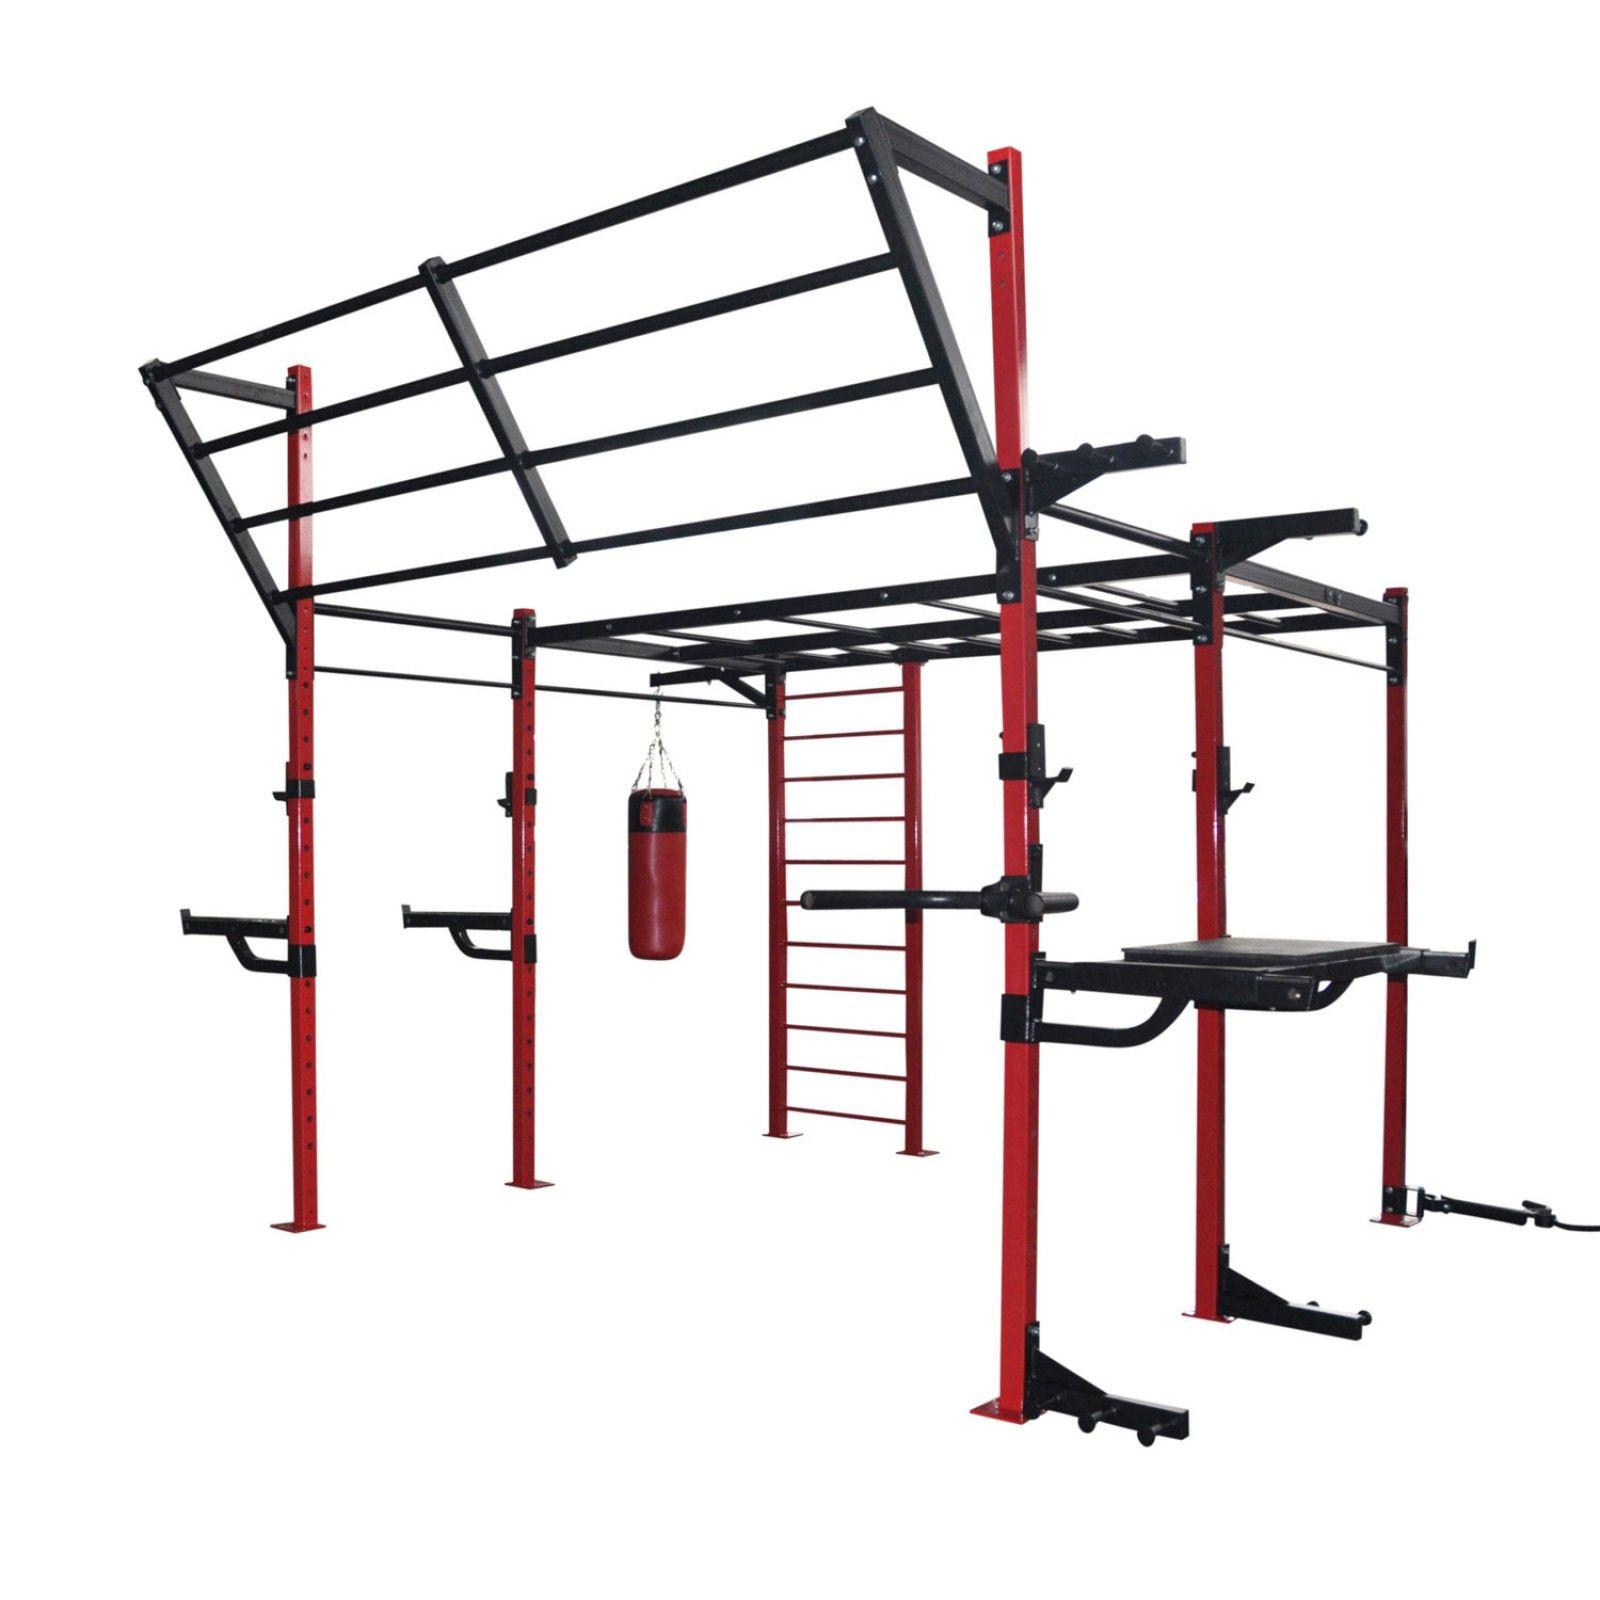 Gym Equipment Adelaide: Bodymax Zenith Line CF880 Functional Training Rig